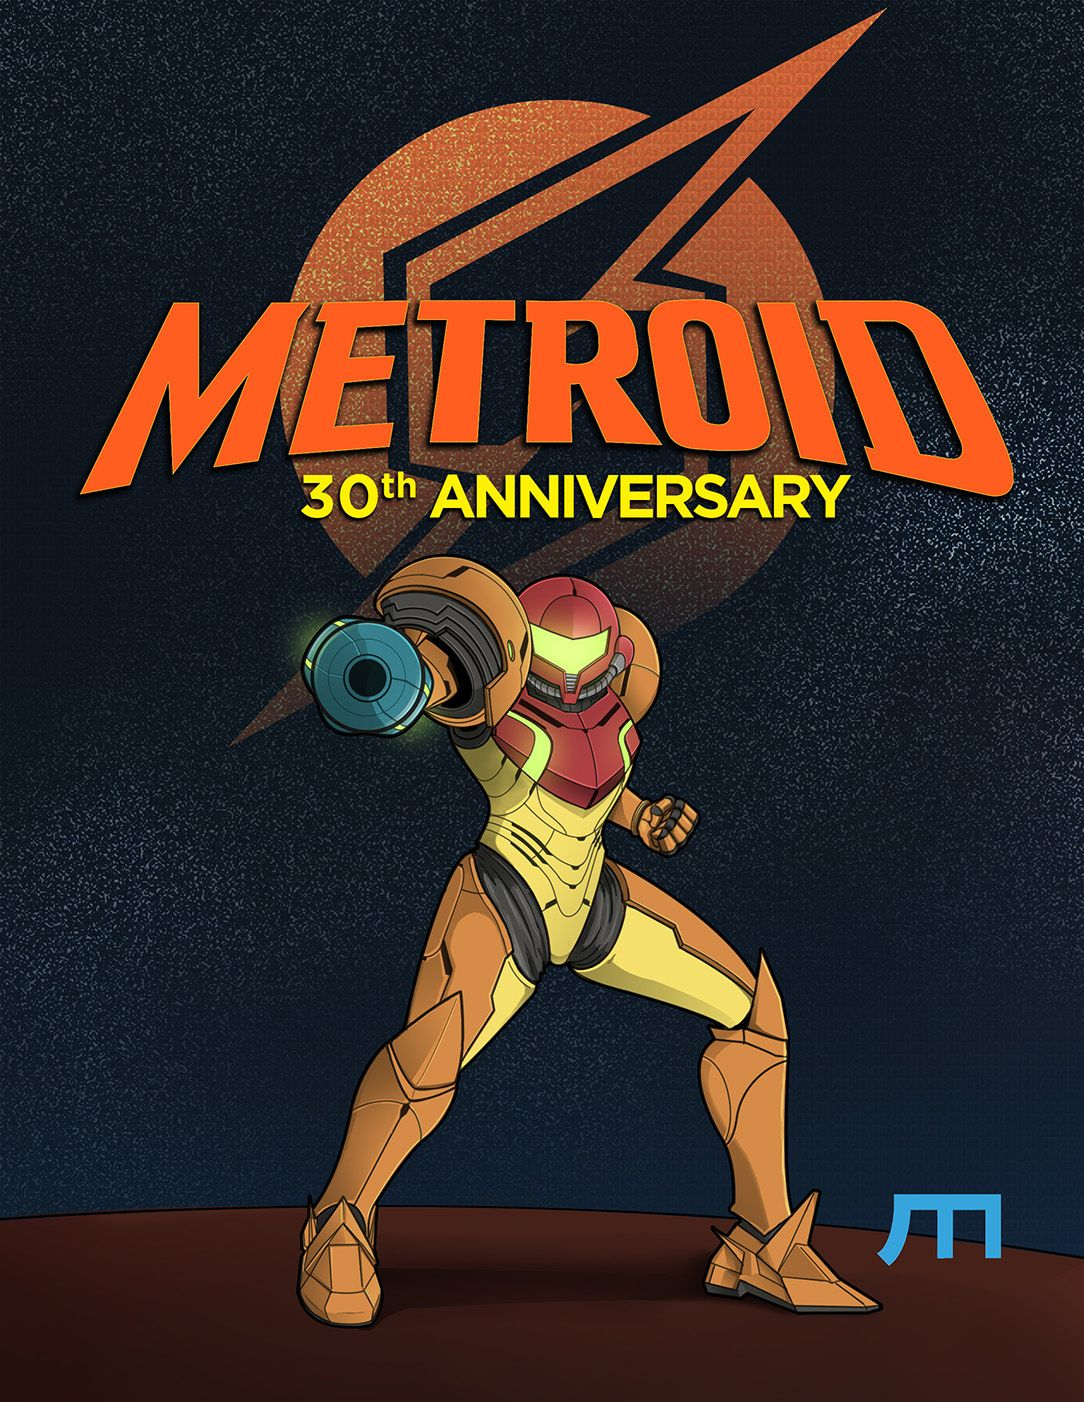 metroid 30th anniversary geekery animatory stuffery pt 2